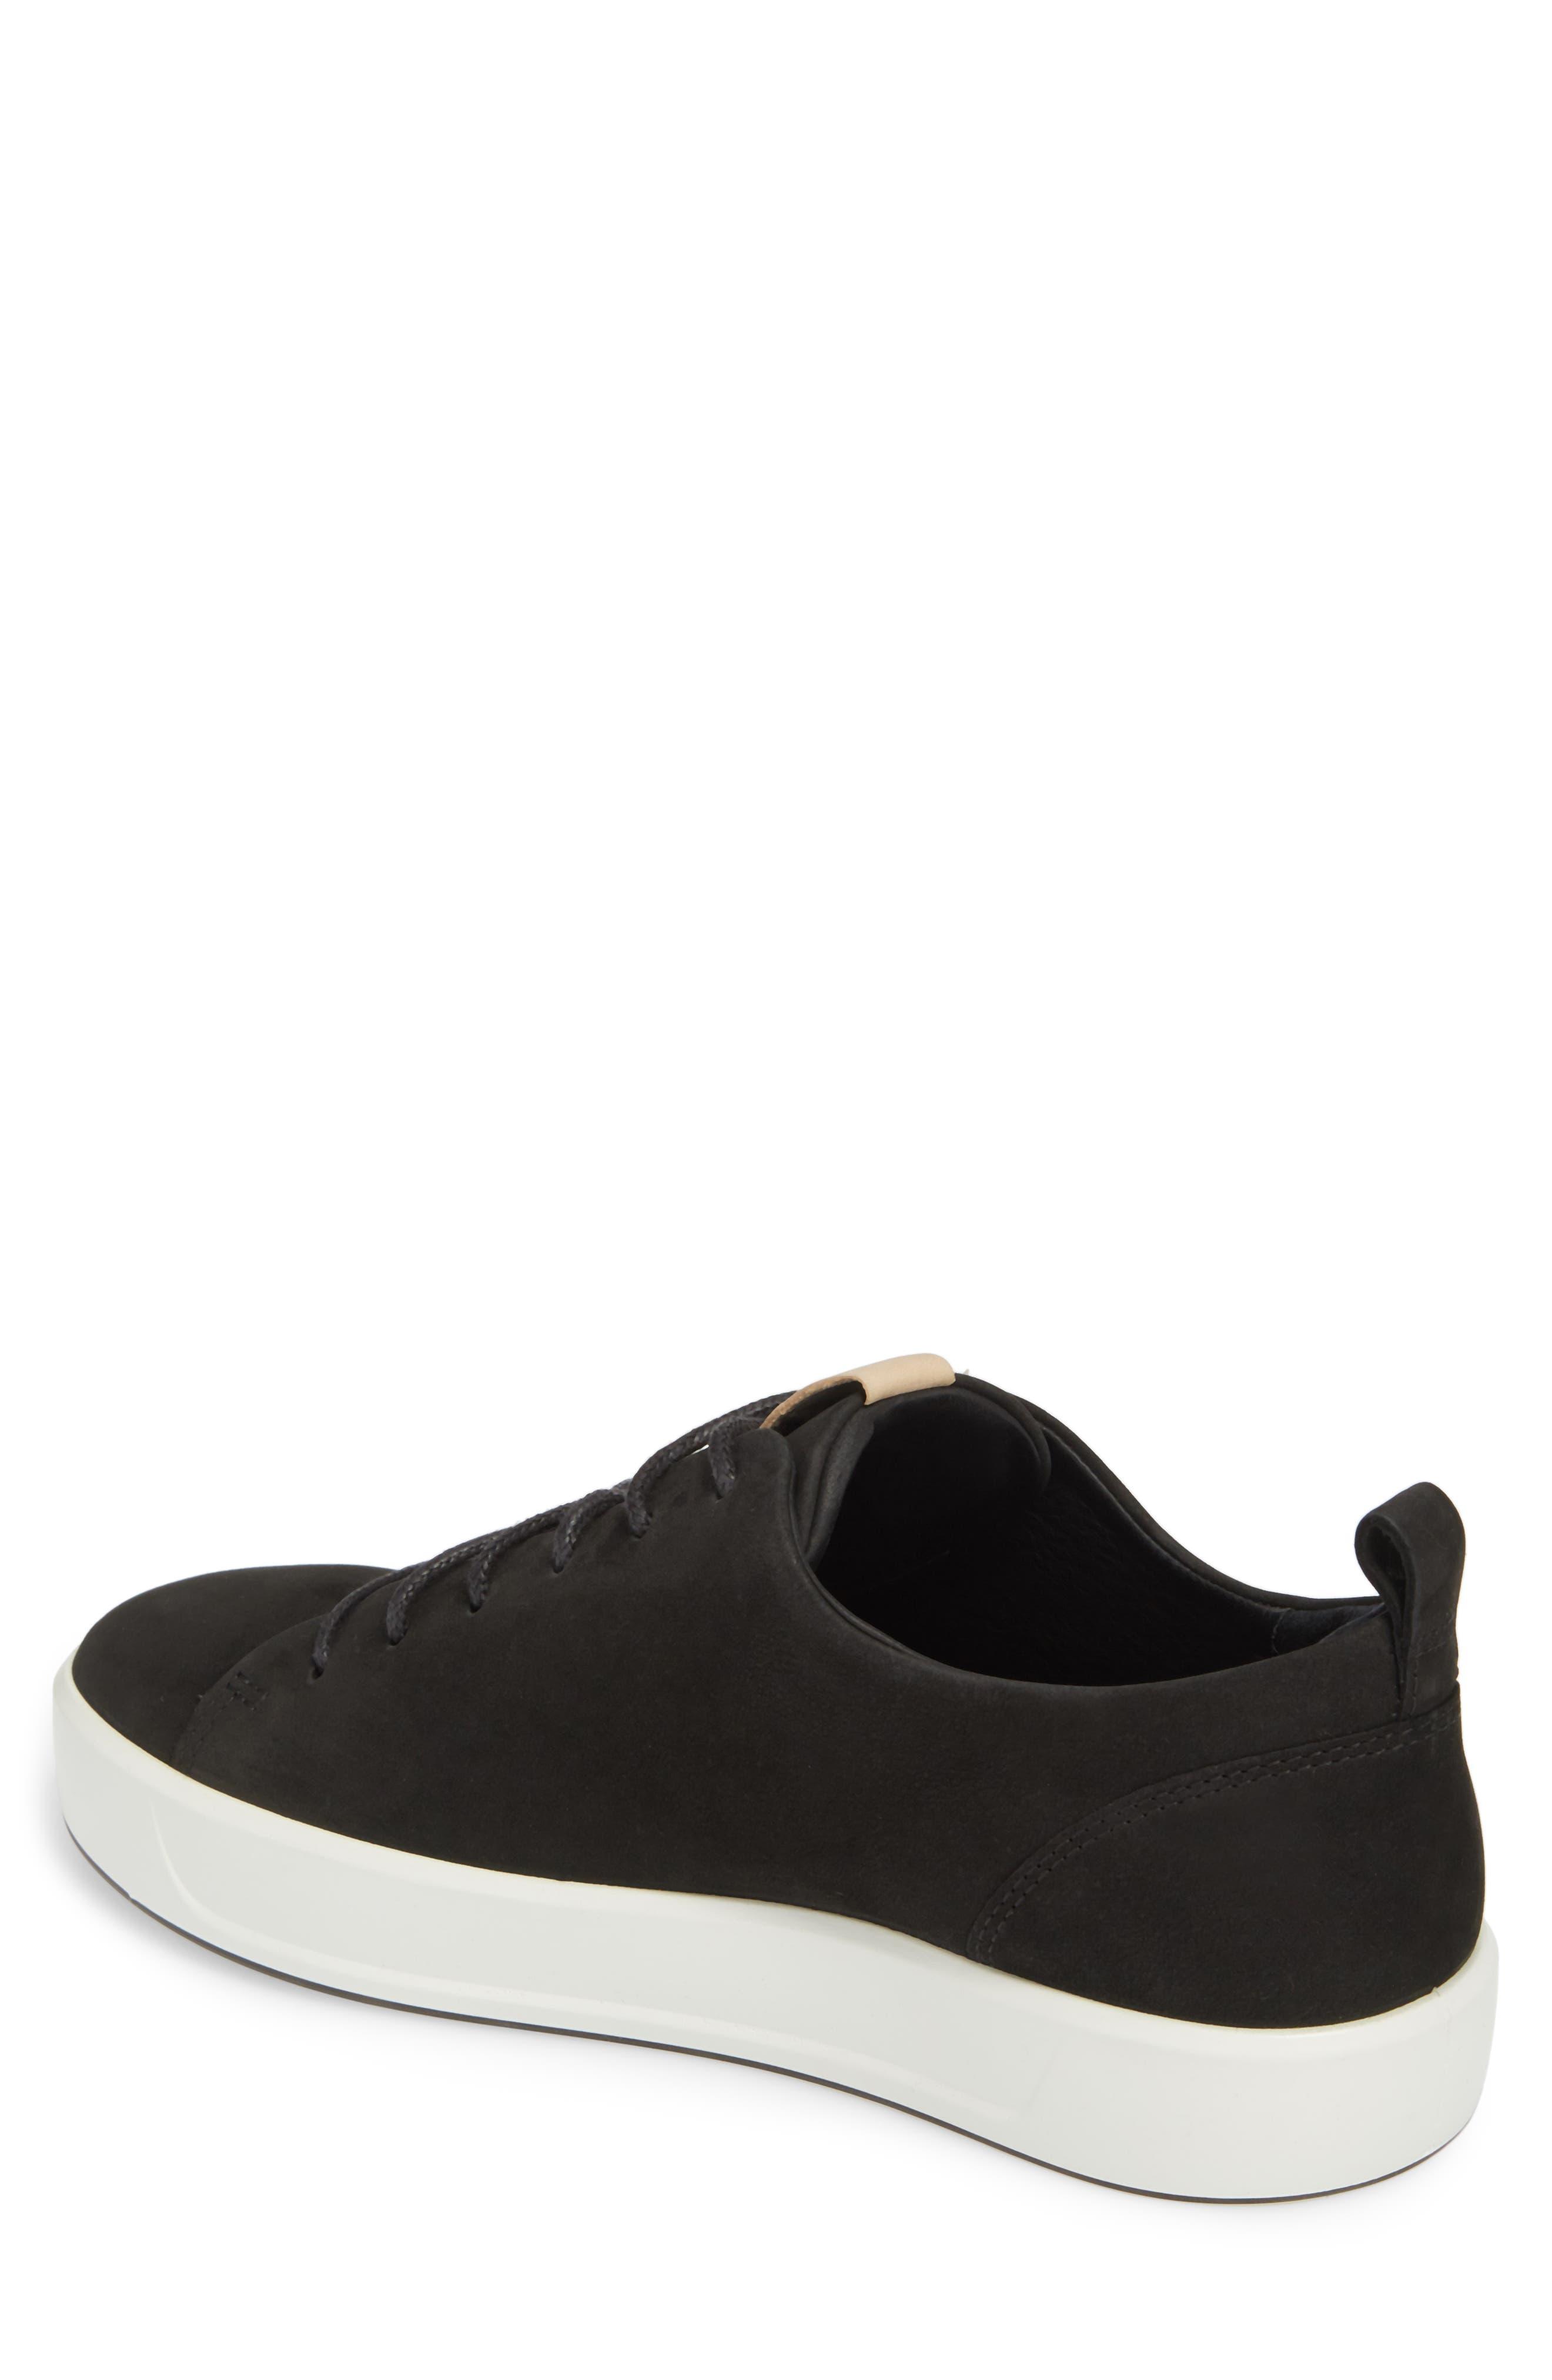 Soft 8 Sneaker,                             Alternate thumbnail 2, color,                             BLACK POWDER LEATHER